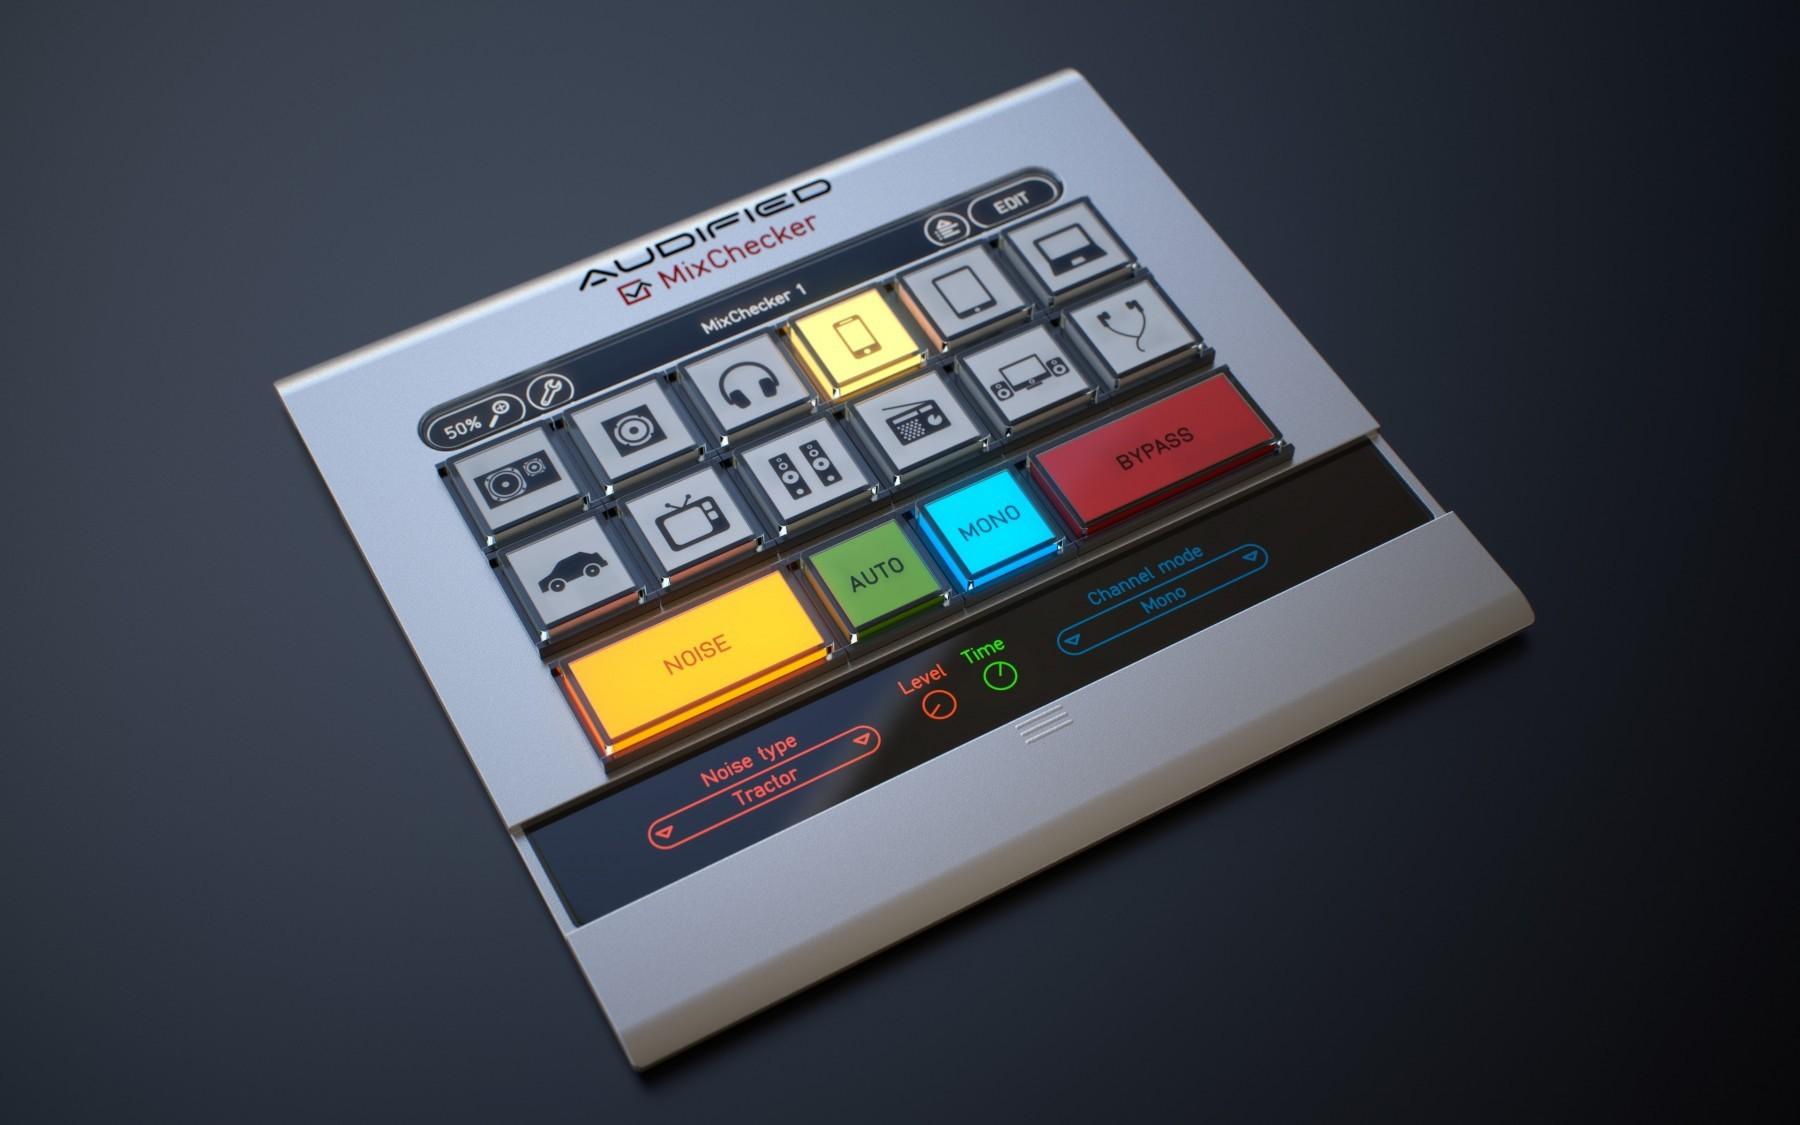 Gearslutz评测:Audified MixChecker Pro